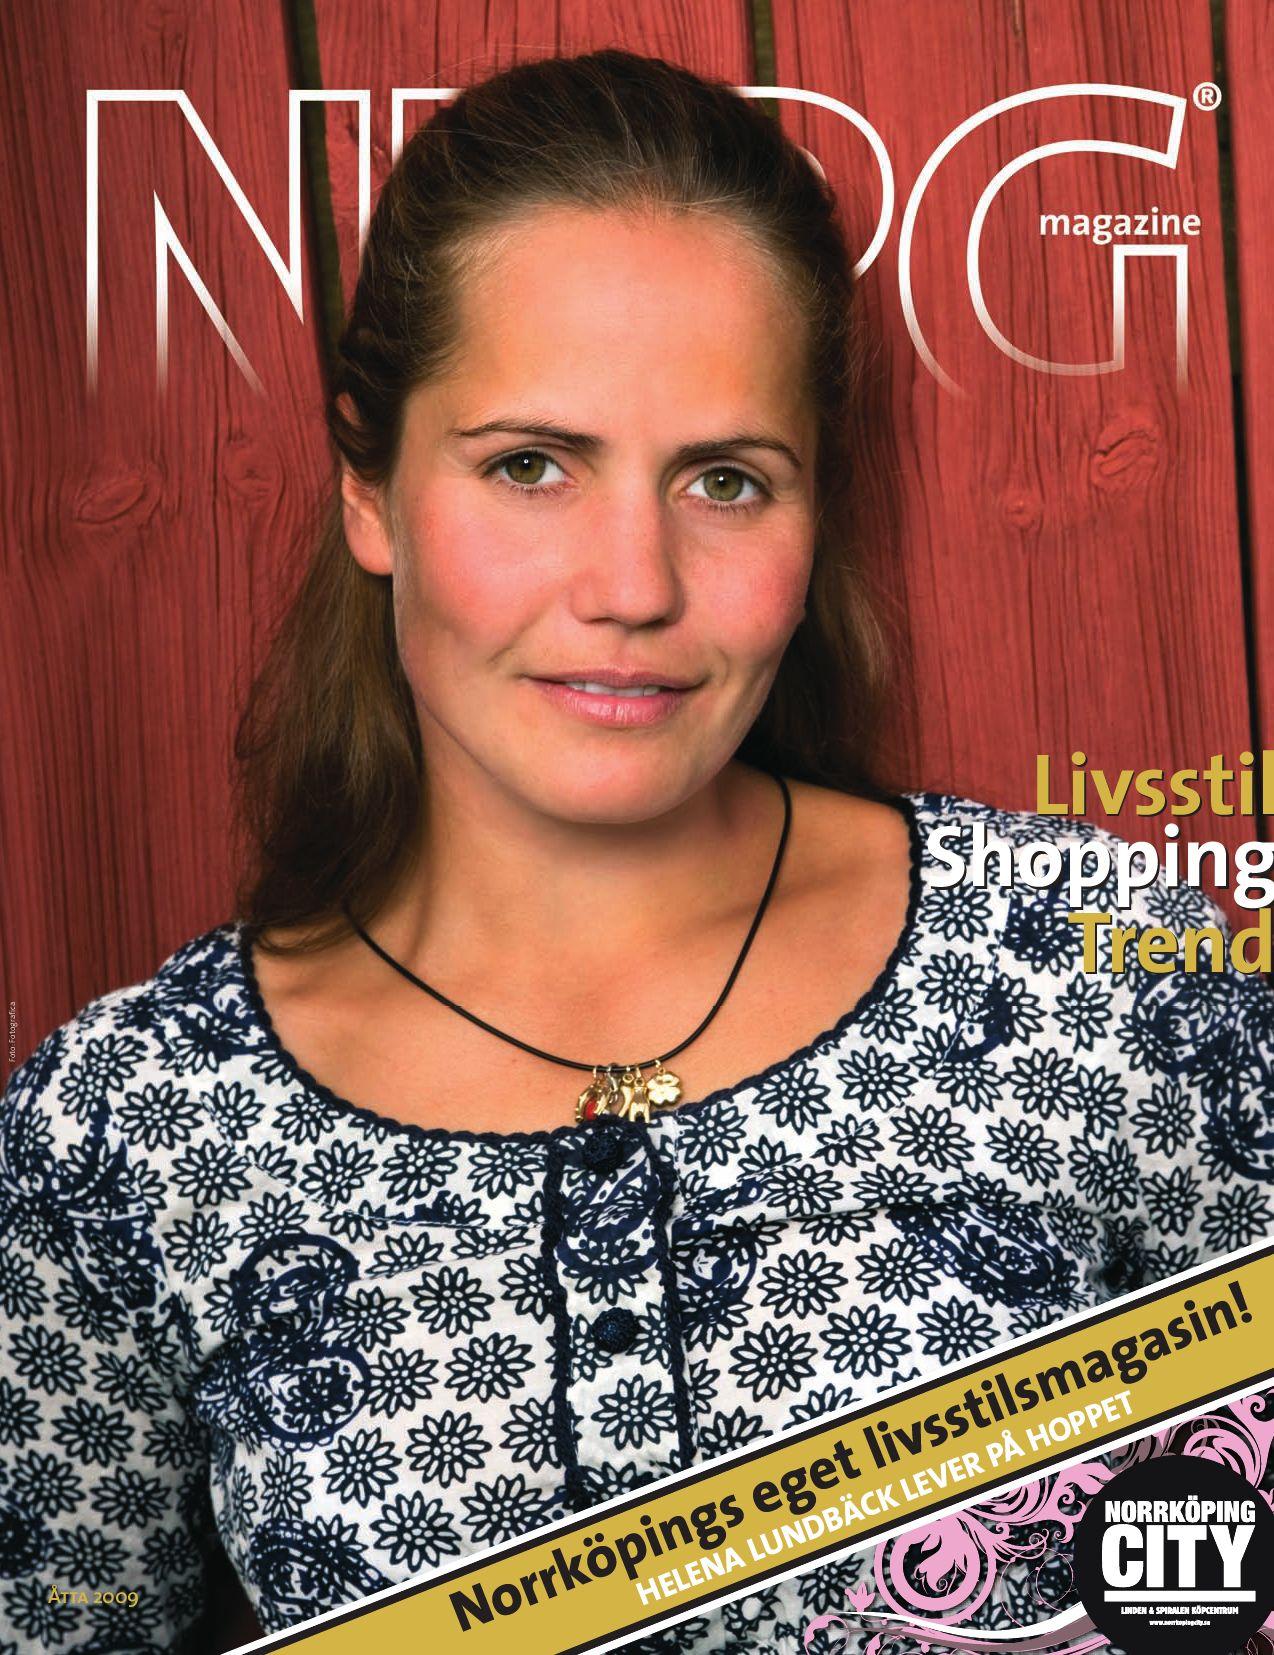 3e170c429583 NKPG Magazine #8-09 by LKPG/NKPG Magazine - issuu